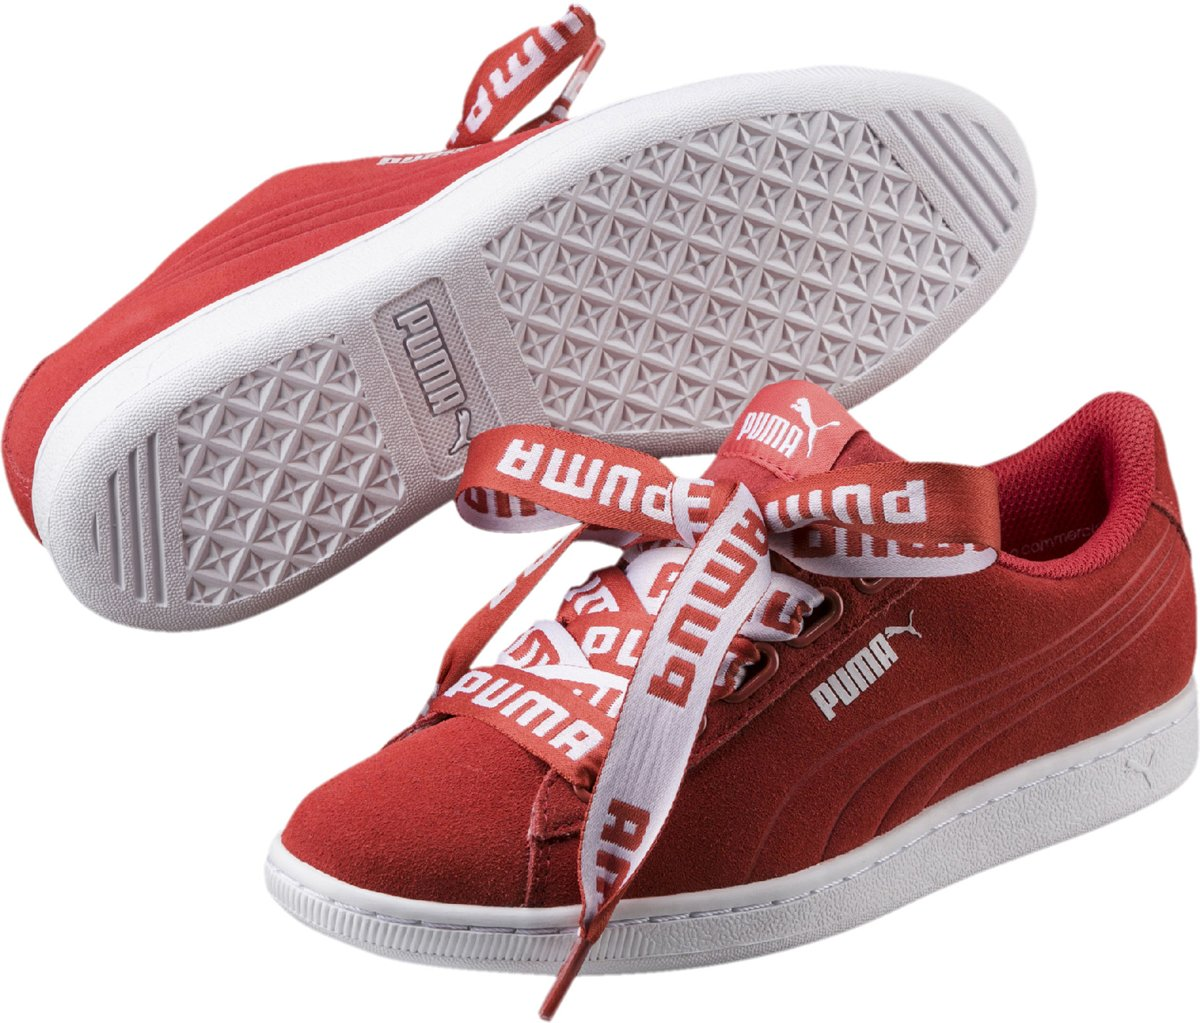 Vikky Ruban Baskets Puma - Taille 40,5 - Femmes - Rouge / Blanc